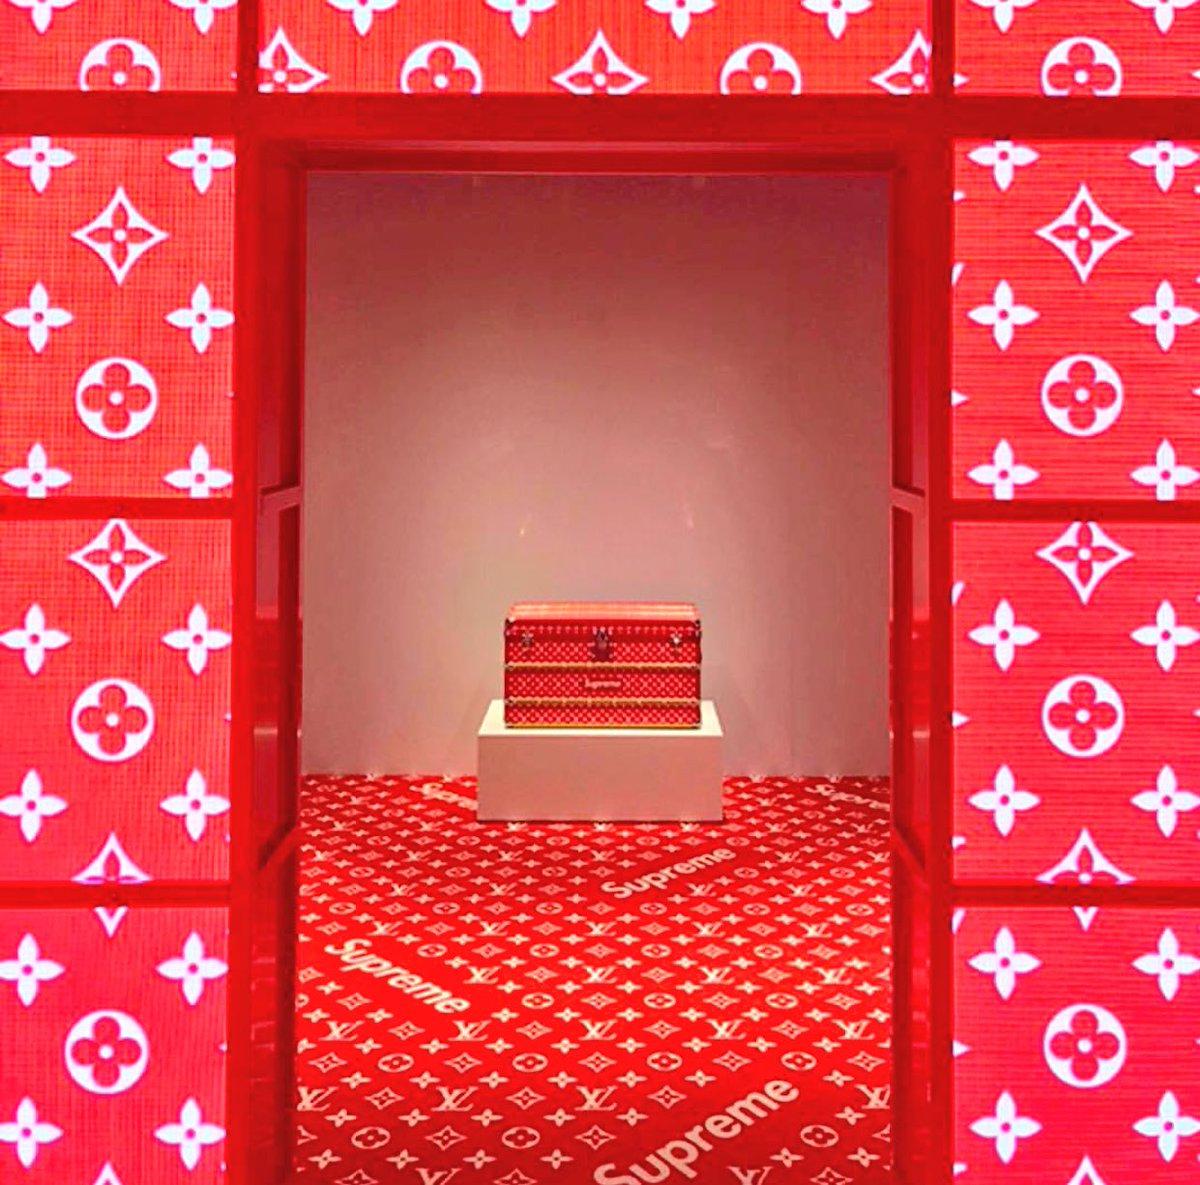 8b79c13b8d Supreme x Louis Vuitton Pop-Up Shops open tomorrow Paris Seoul Sydney Tokyo  Beijing London Miami Los Angelespic.twitter.com/U5NjRuuMWU